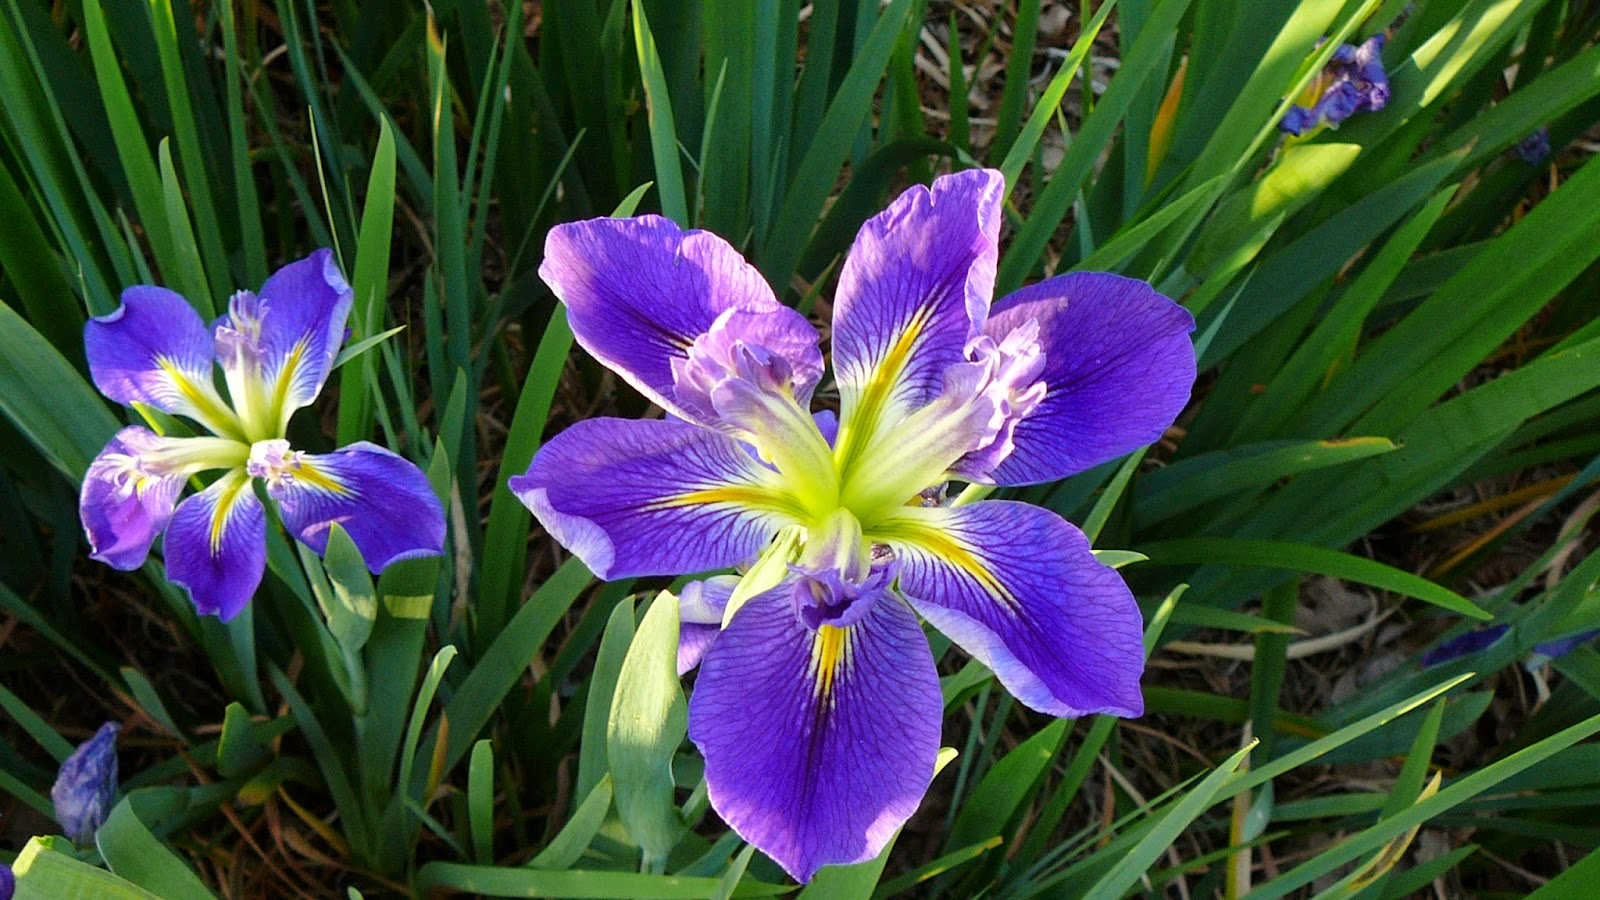 world of irises iris bloom season in northwest louisiana. Black Bedroom Furniture Sets. Home Design Ideas